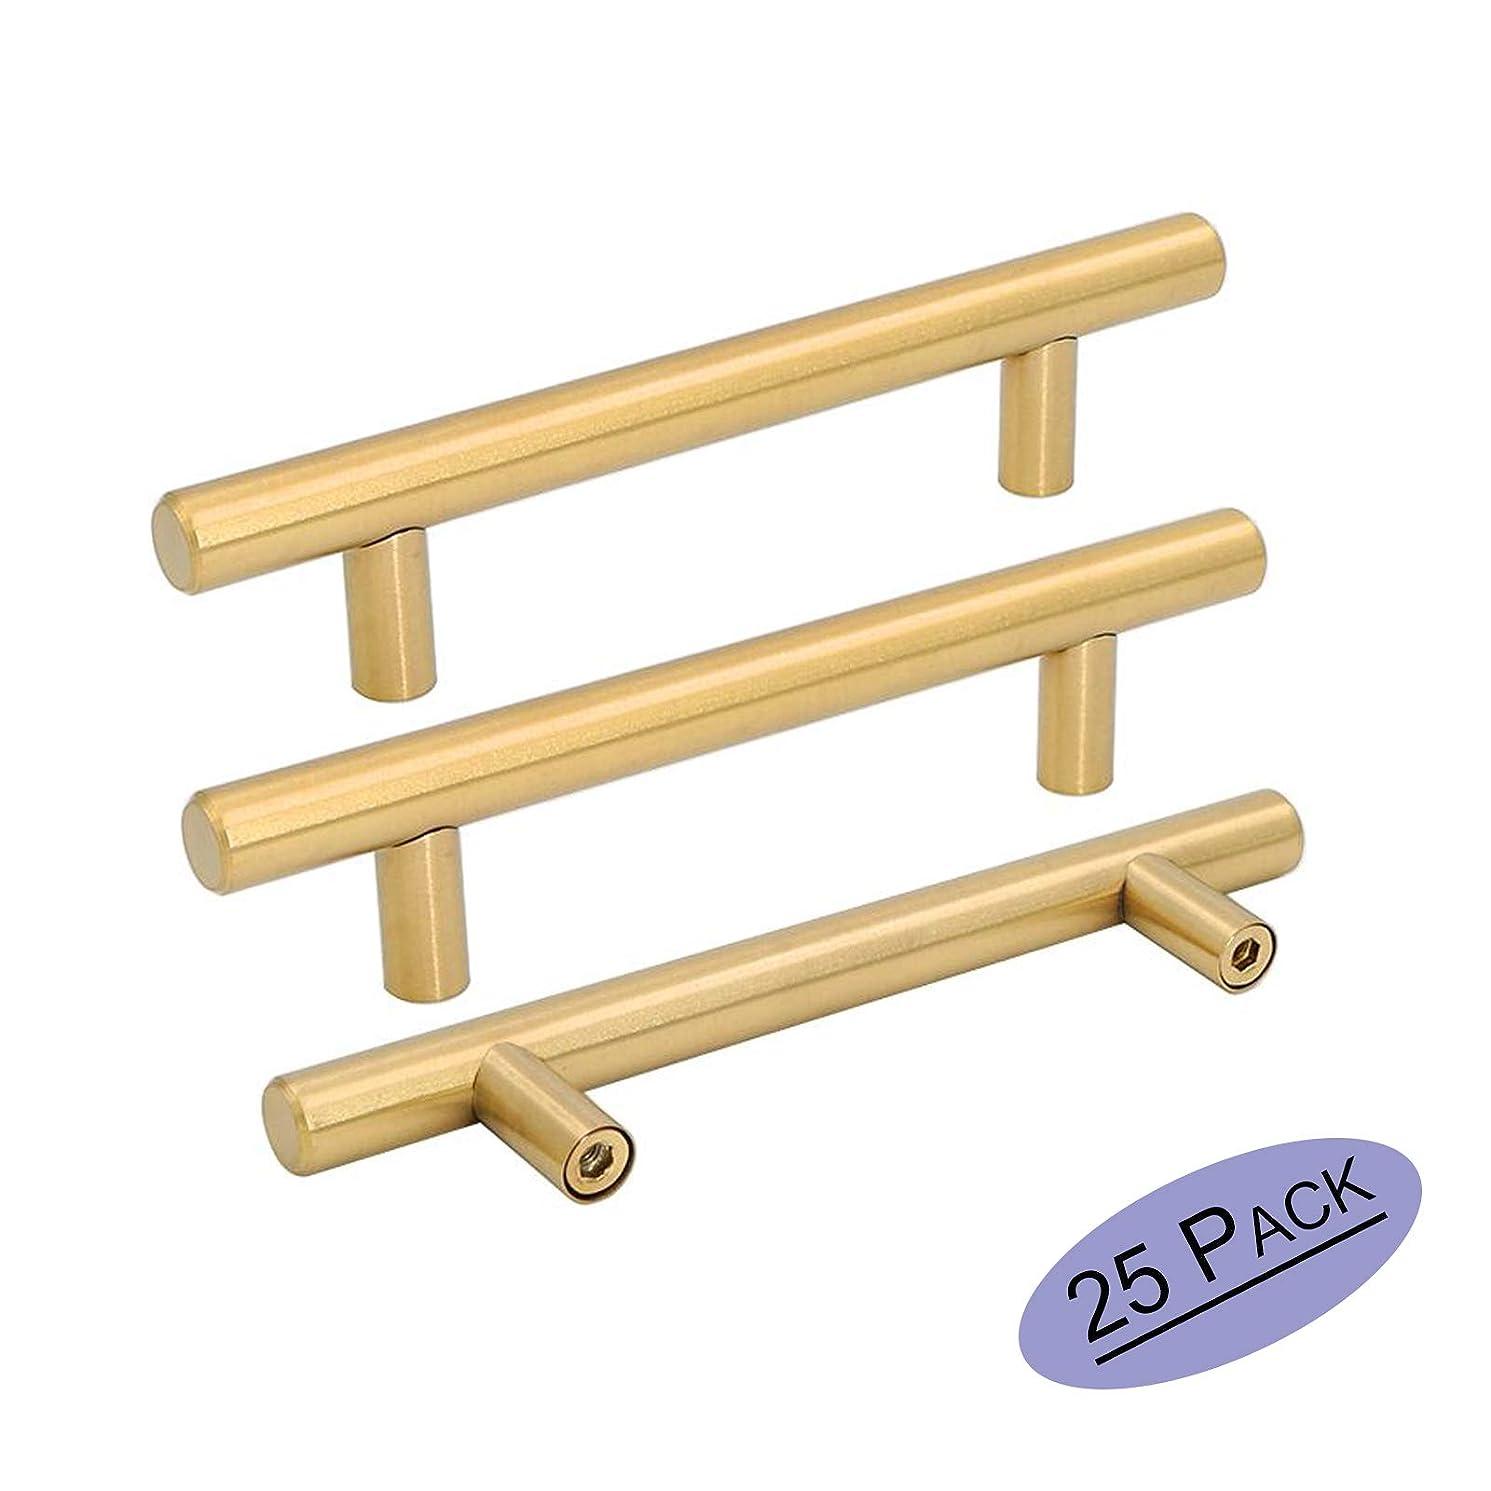 Brushed Brass Kitchen Cabinet Hardware Handle T Bar Handles 1/2